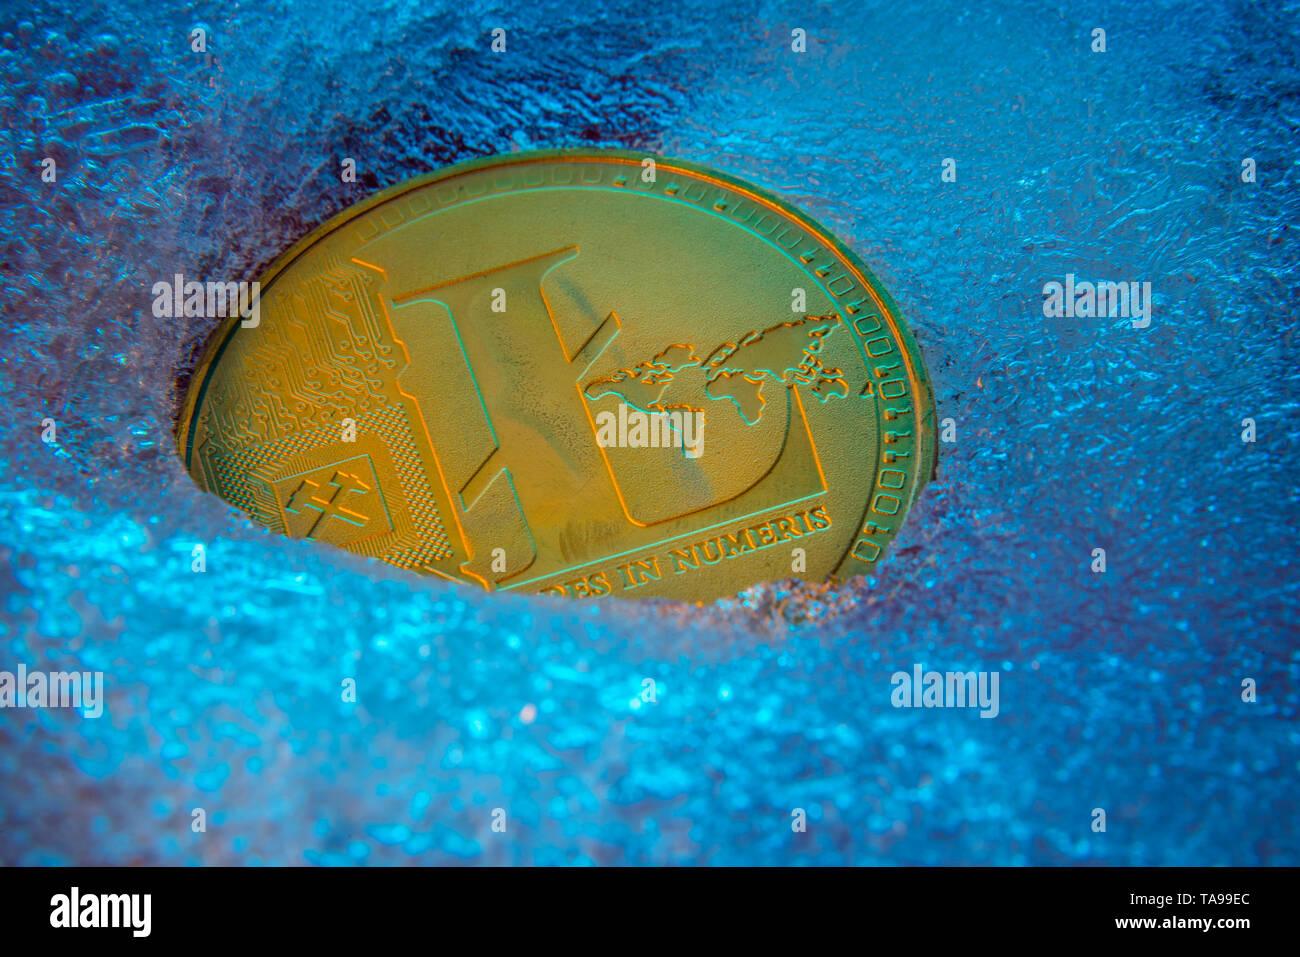 Golden Litecoin coin, lite coin online digital currency frozen in the blue ice. Concept of block chain, market crash. Frozen crypto money, depreciatio - Stock Image